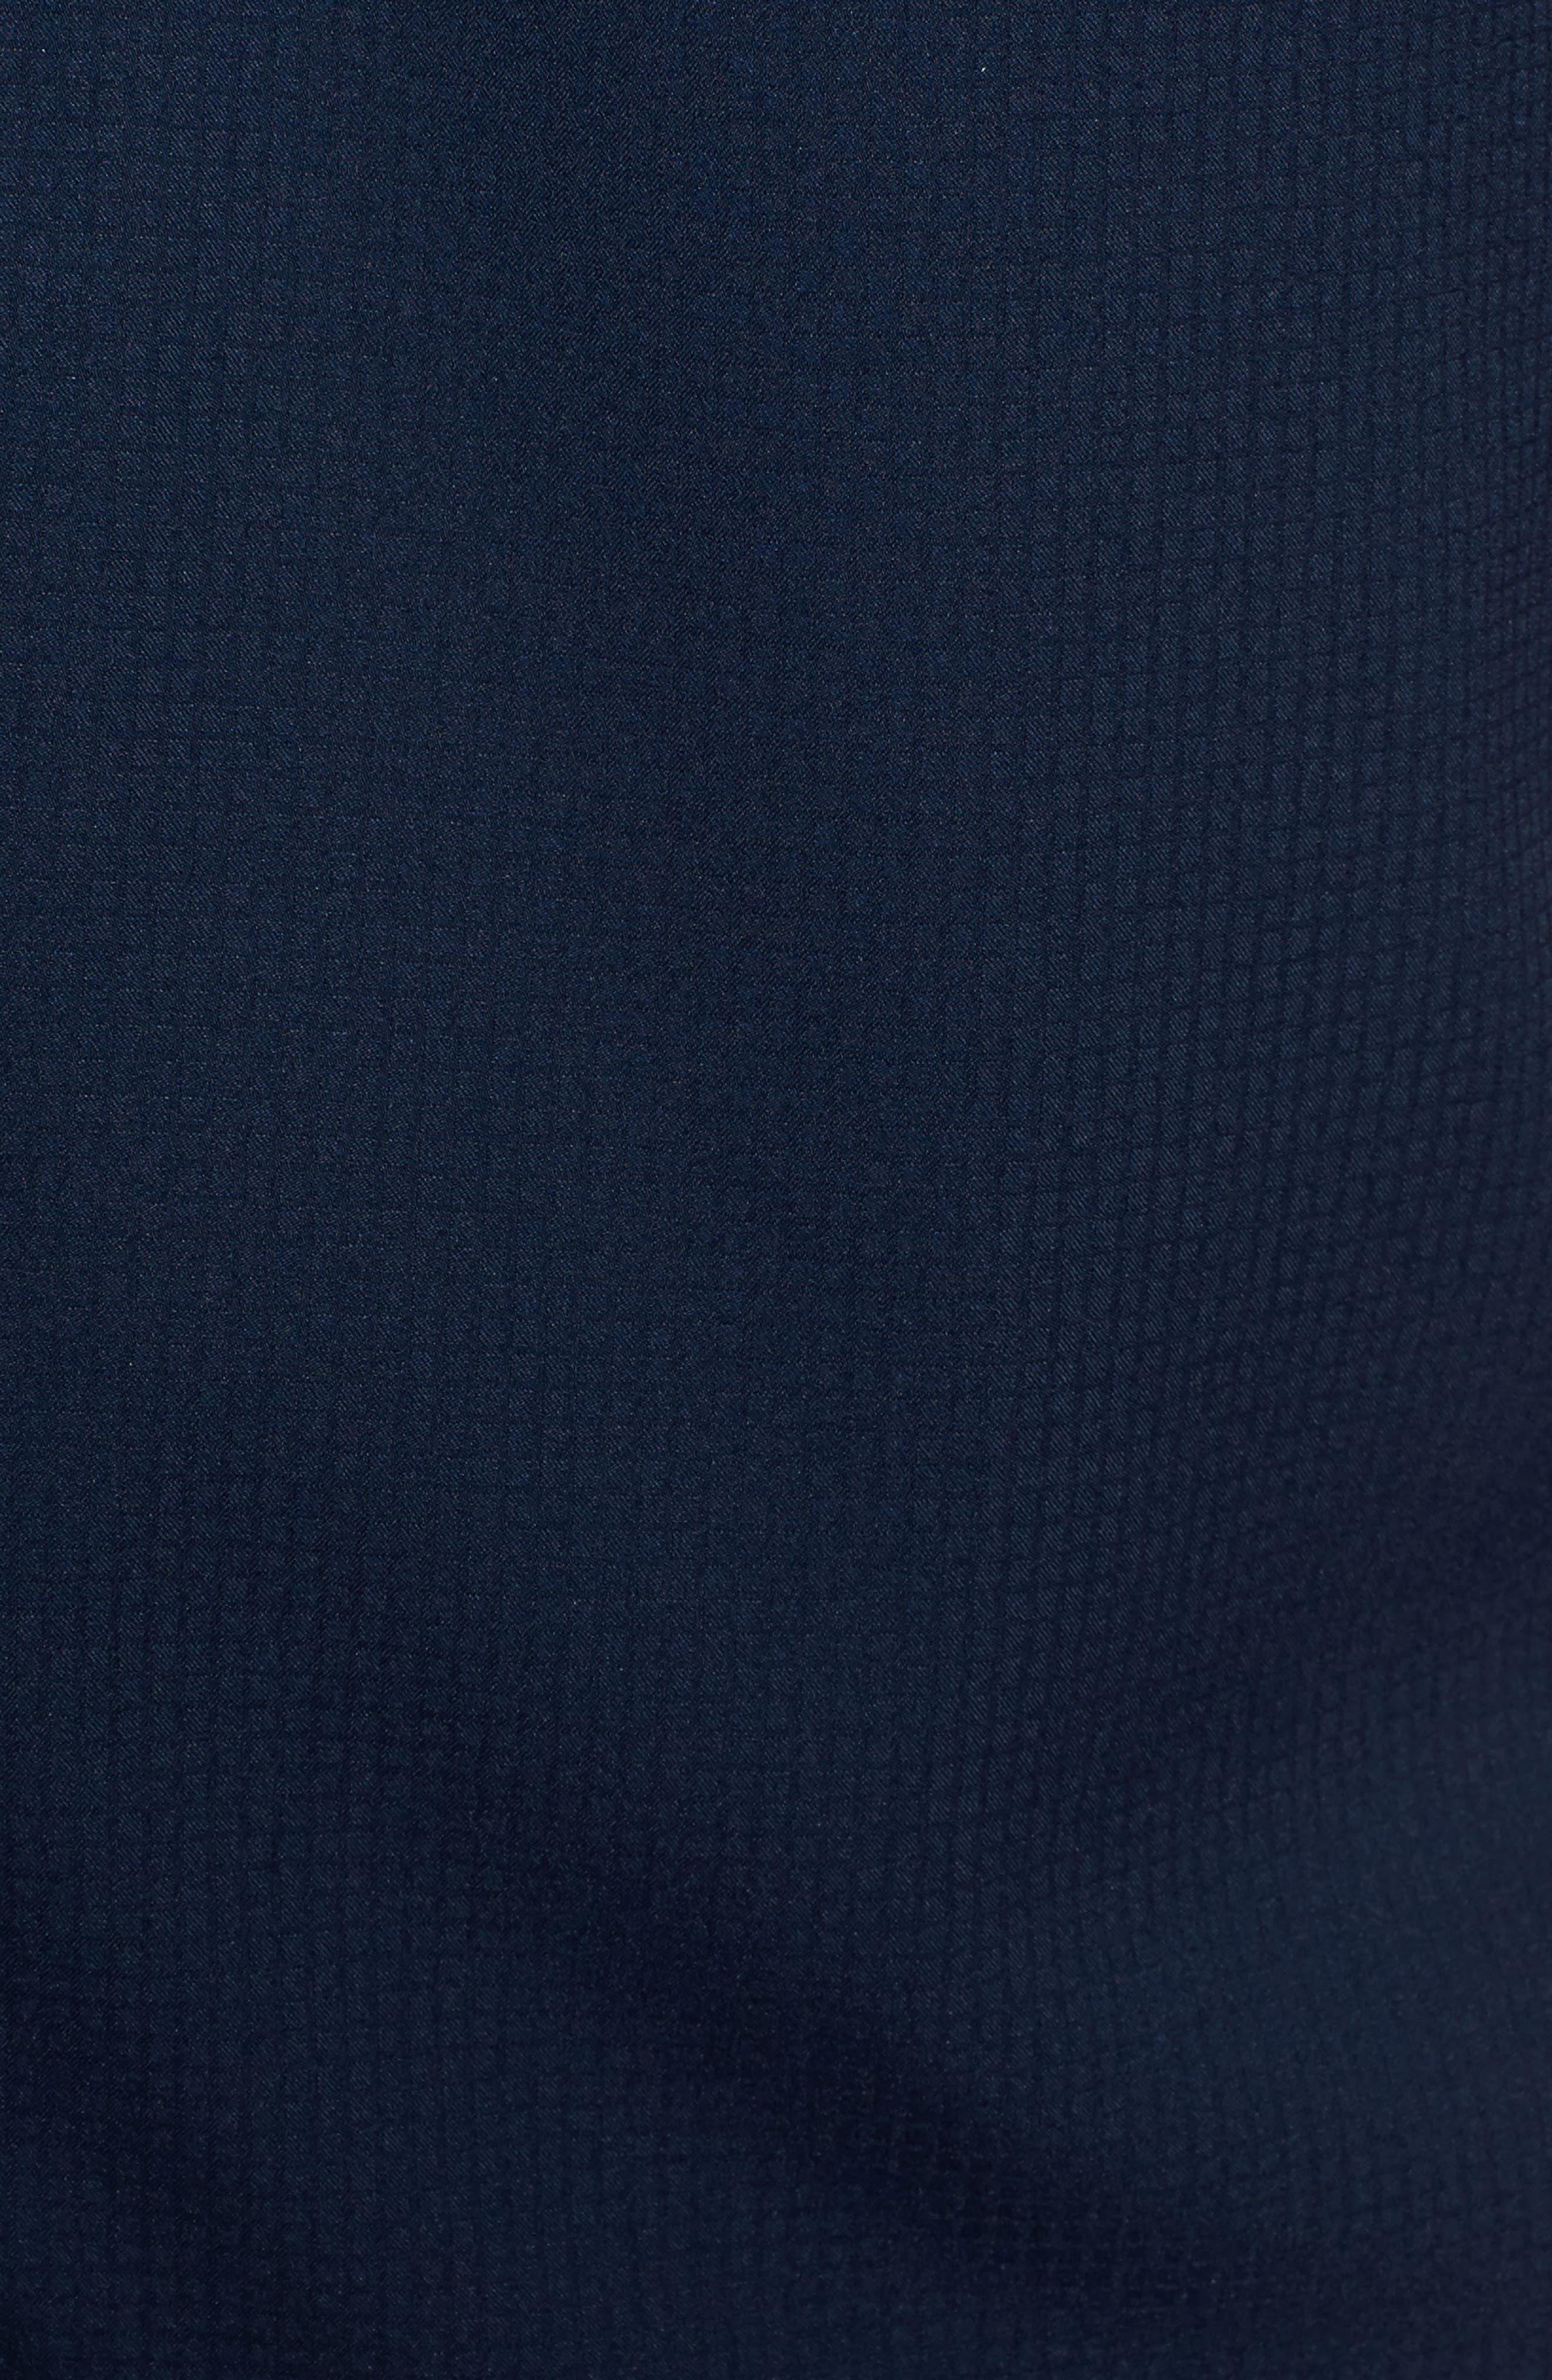 PFG Low Drag Offshore Woven Shirt,                             Alternate thumbnail 22, color,